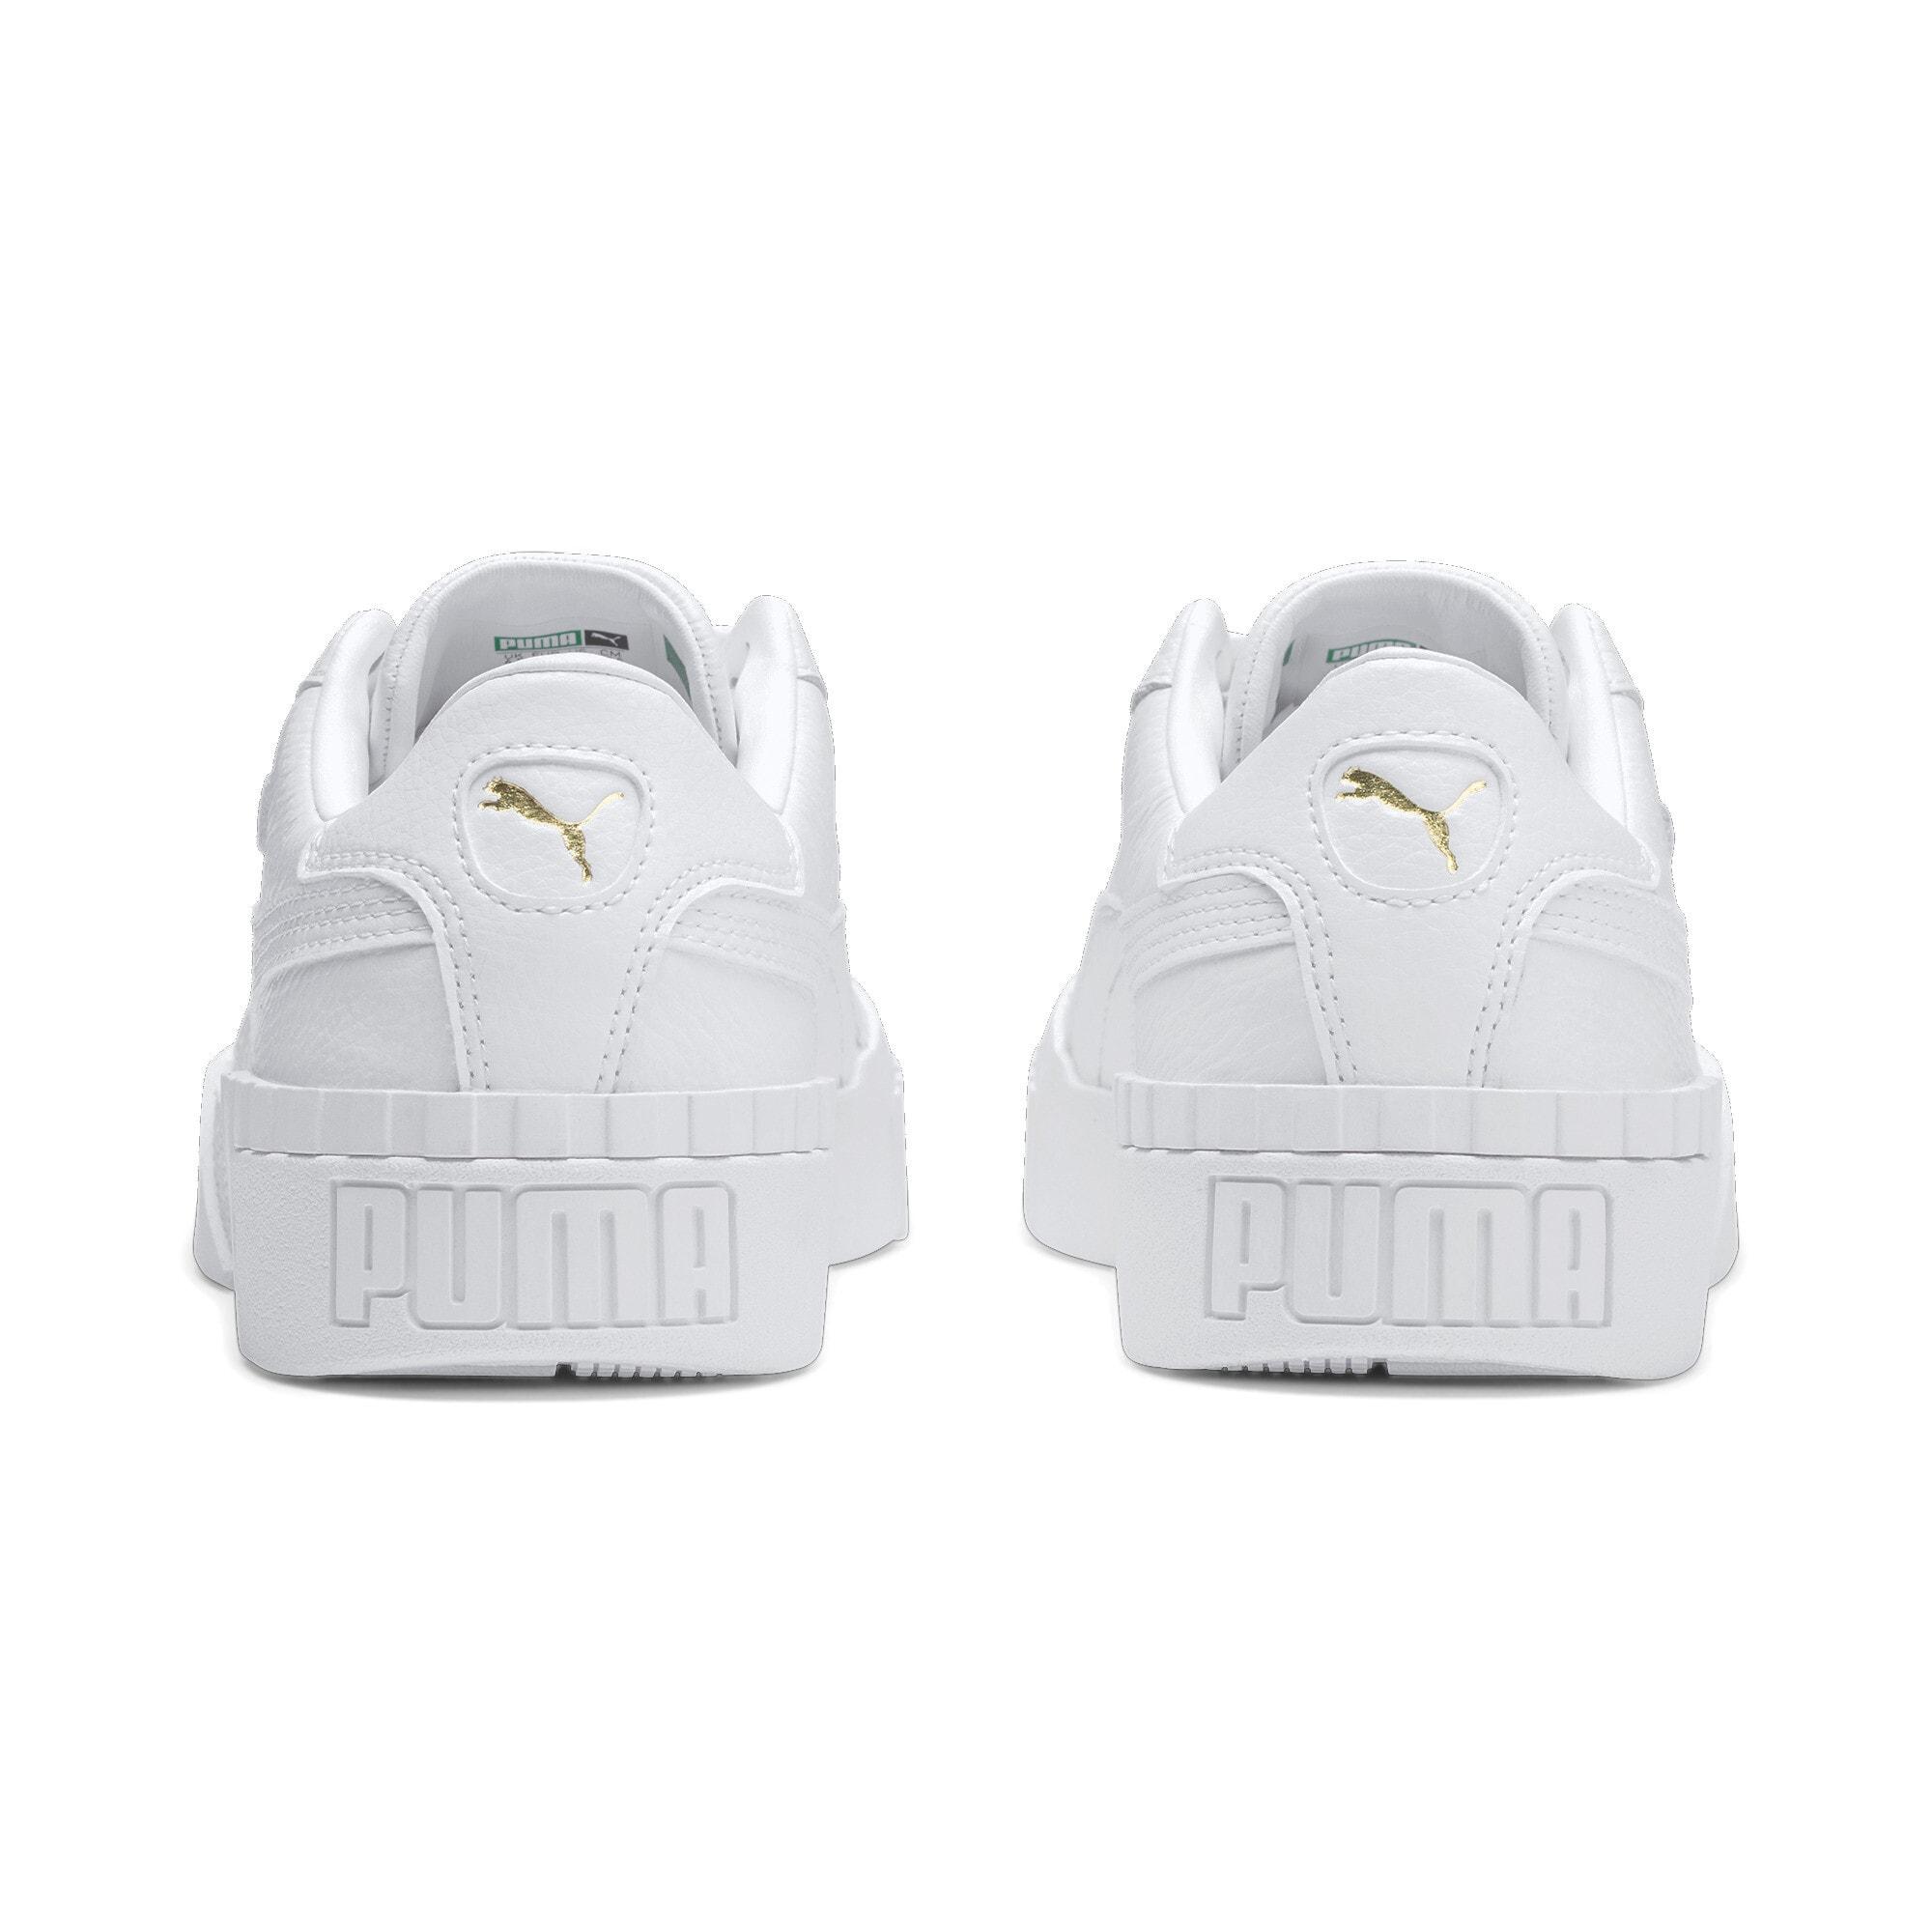 Thumbnail 4 of Cali Women's Sneakers, Puma White-Puma White, medium